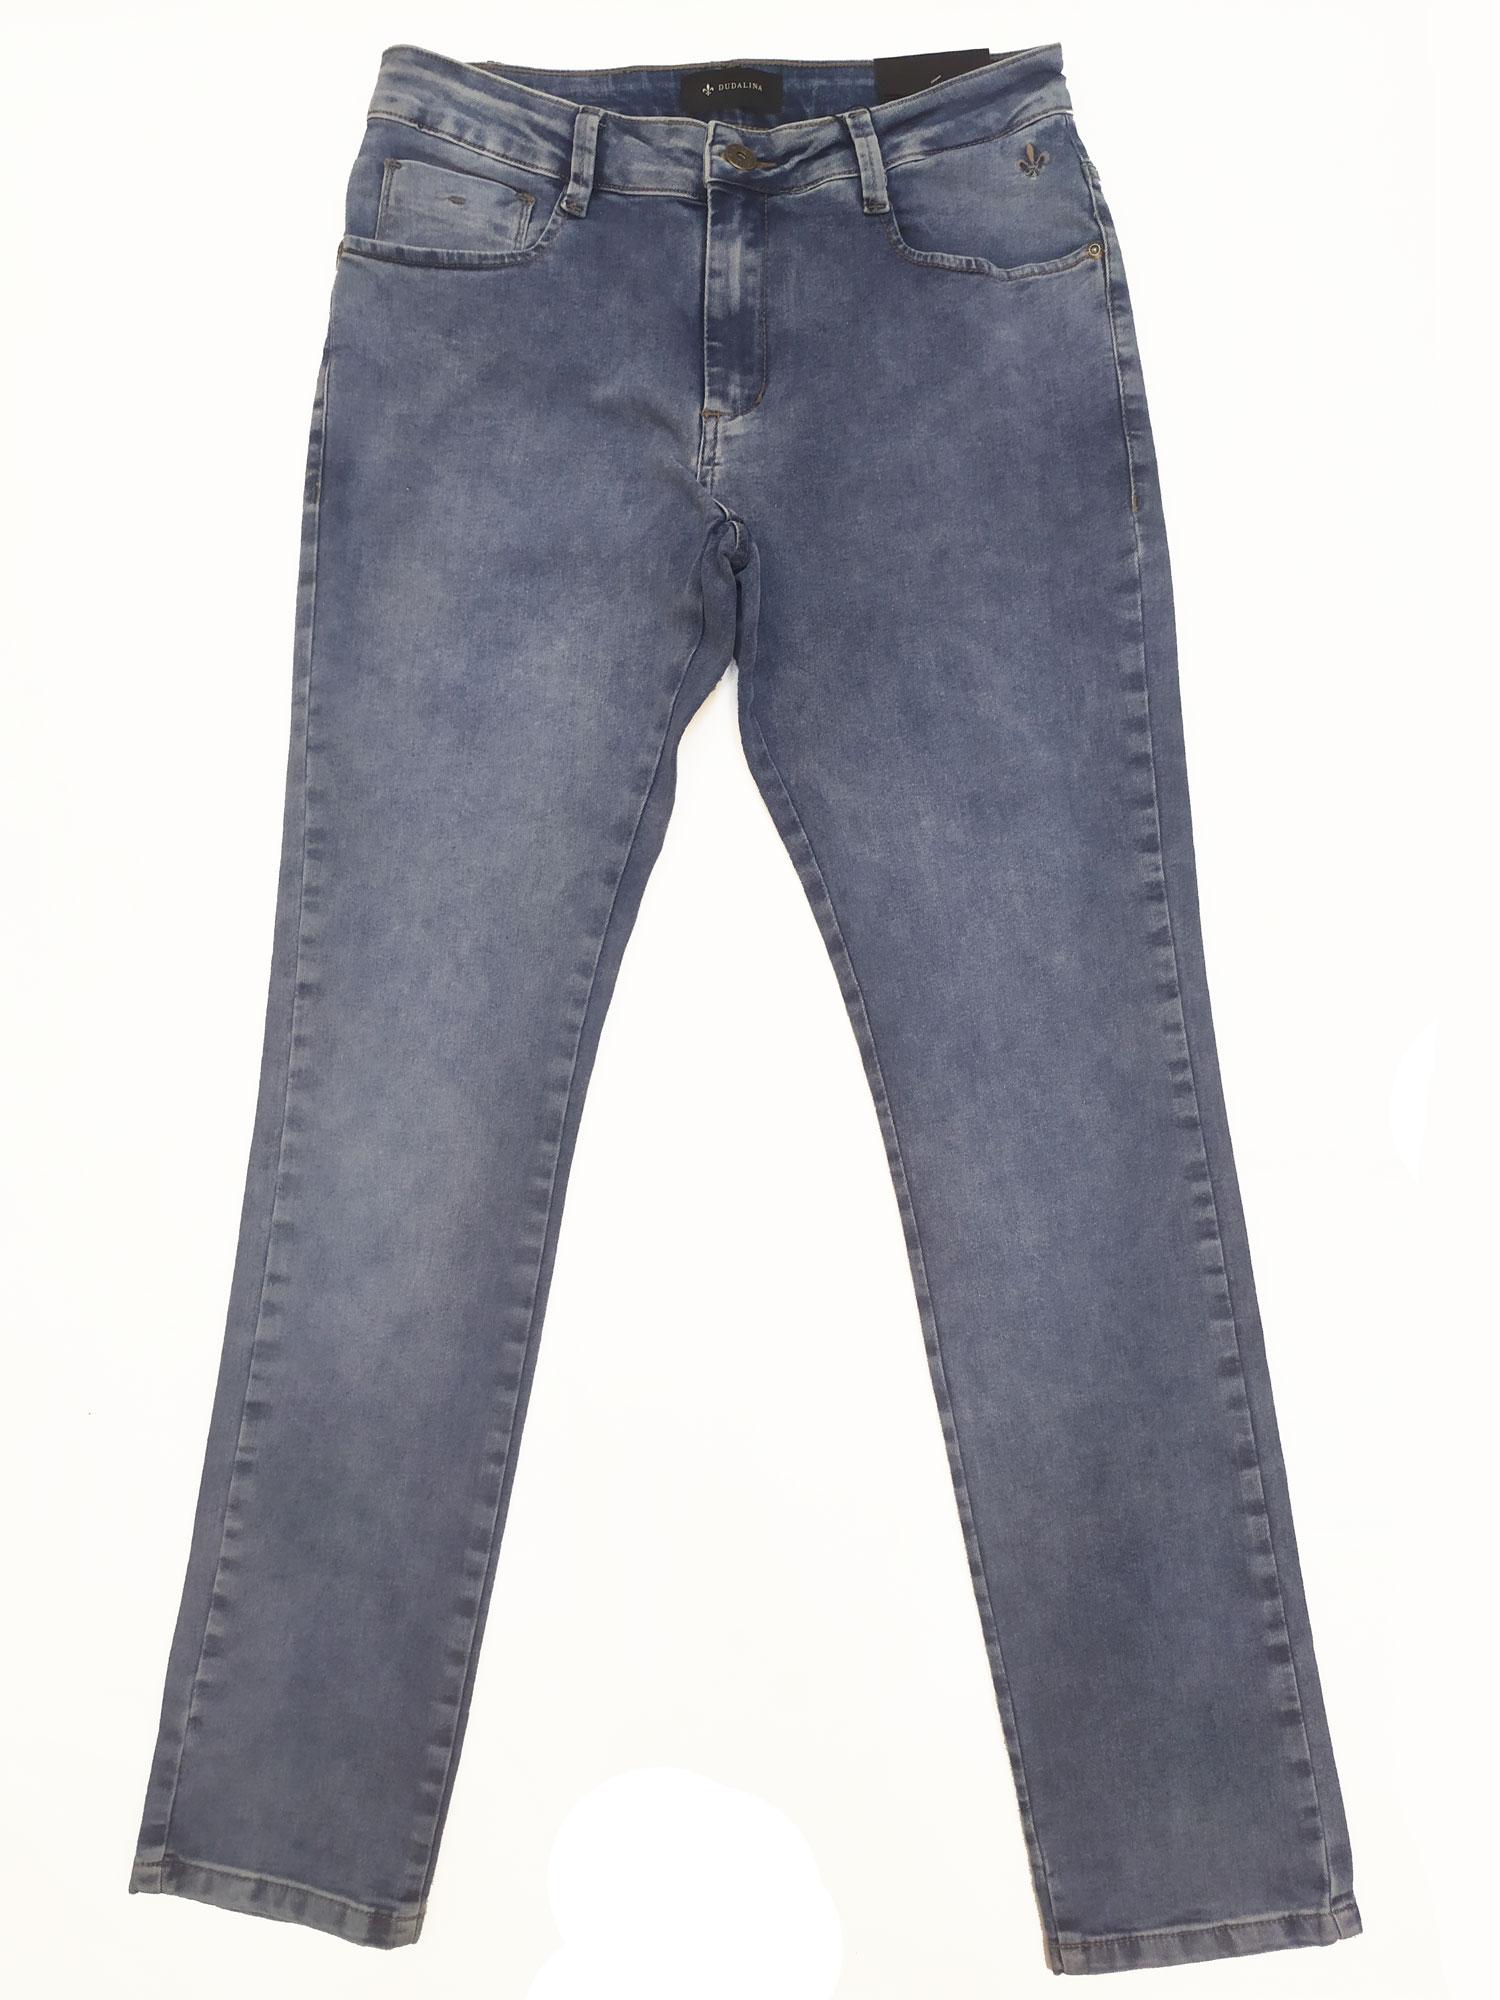 Calça Jeans Masculina slim Light Blue Dudalina